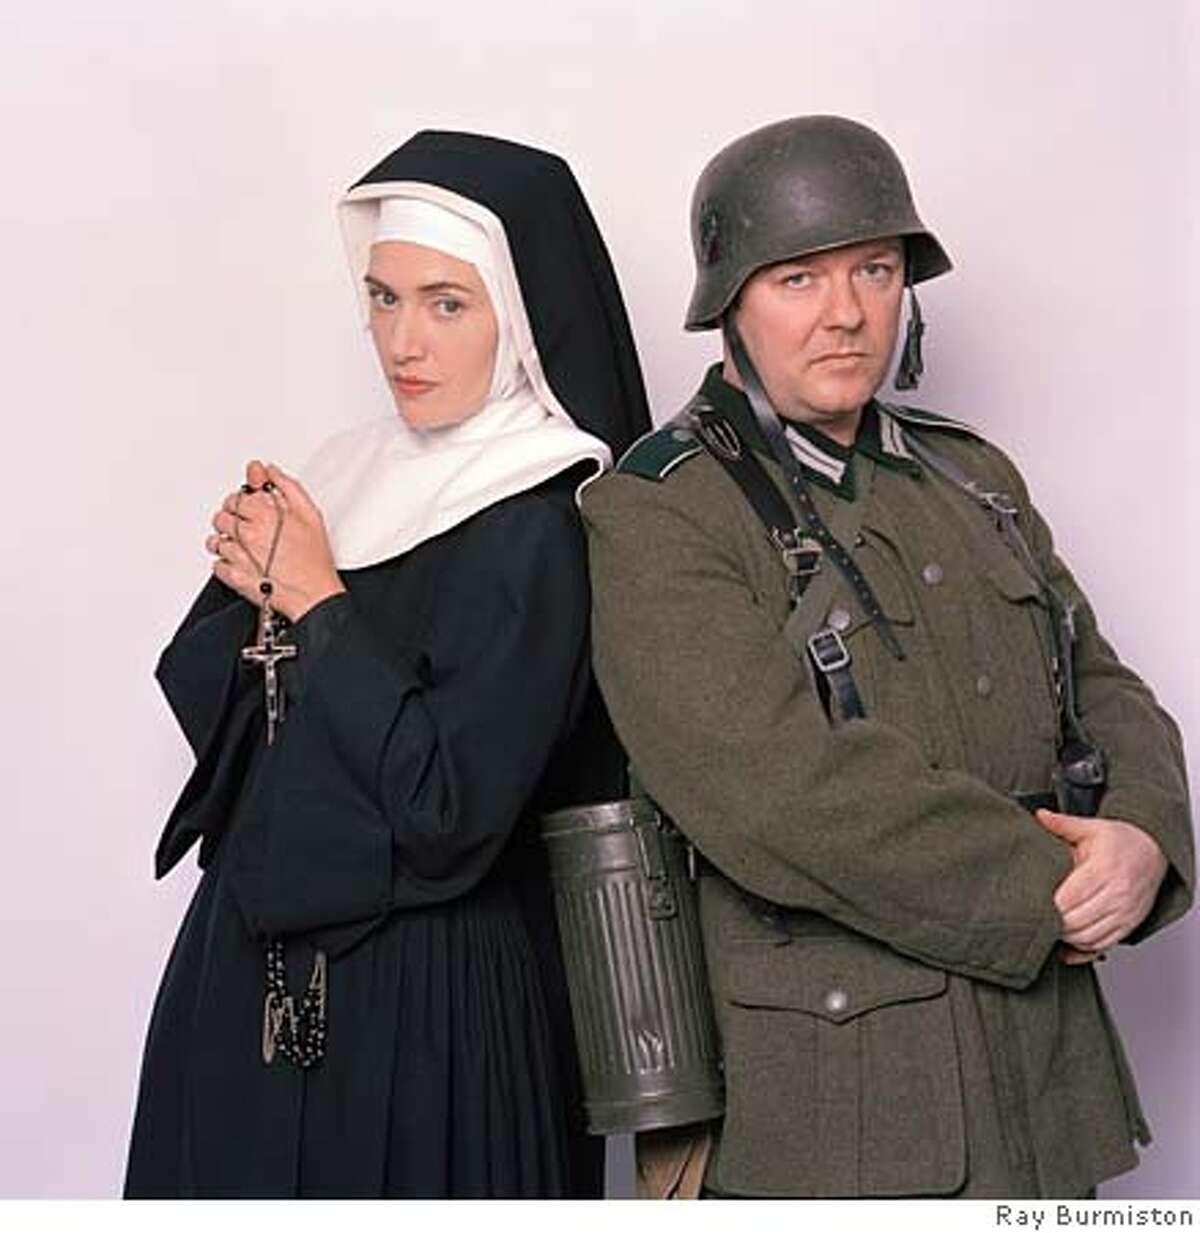 GOODMAN23_07.JPG EXTRAS: Kate Winslet, Ricky Gervais. photo: Ray Burmiston HBO